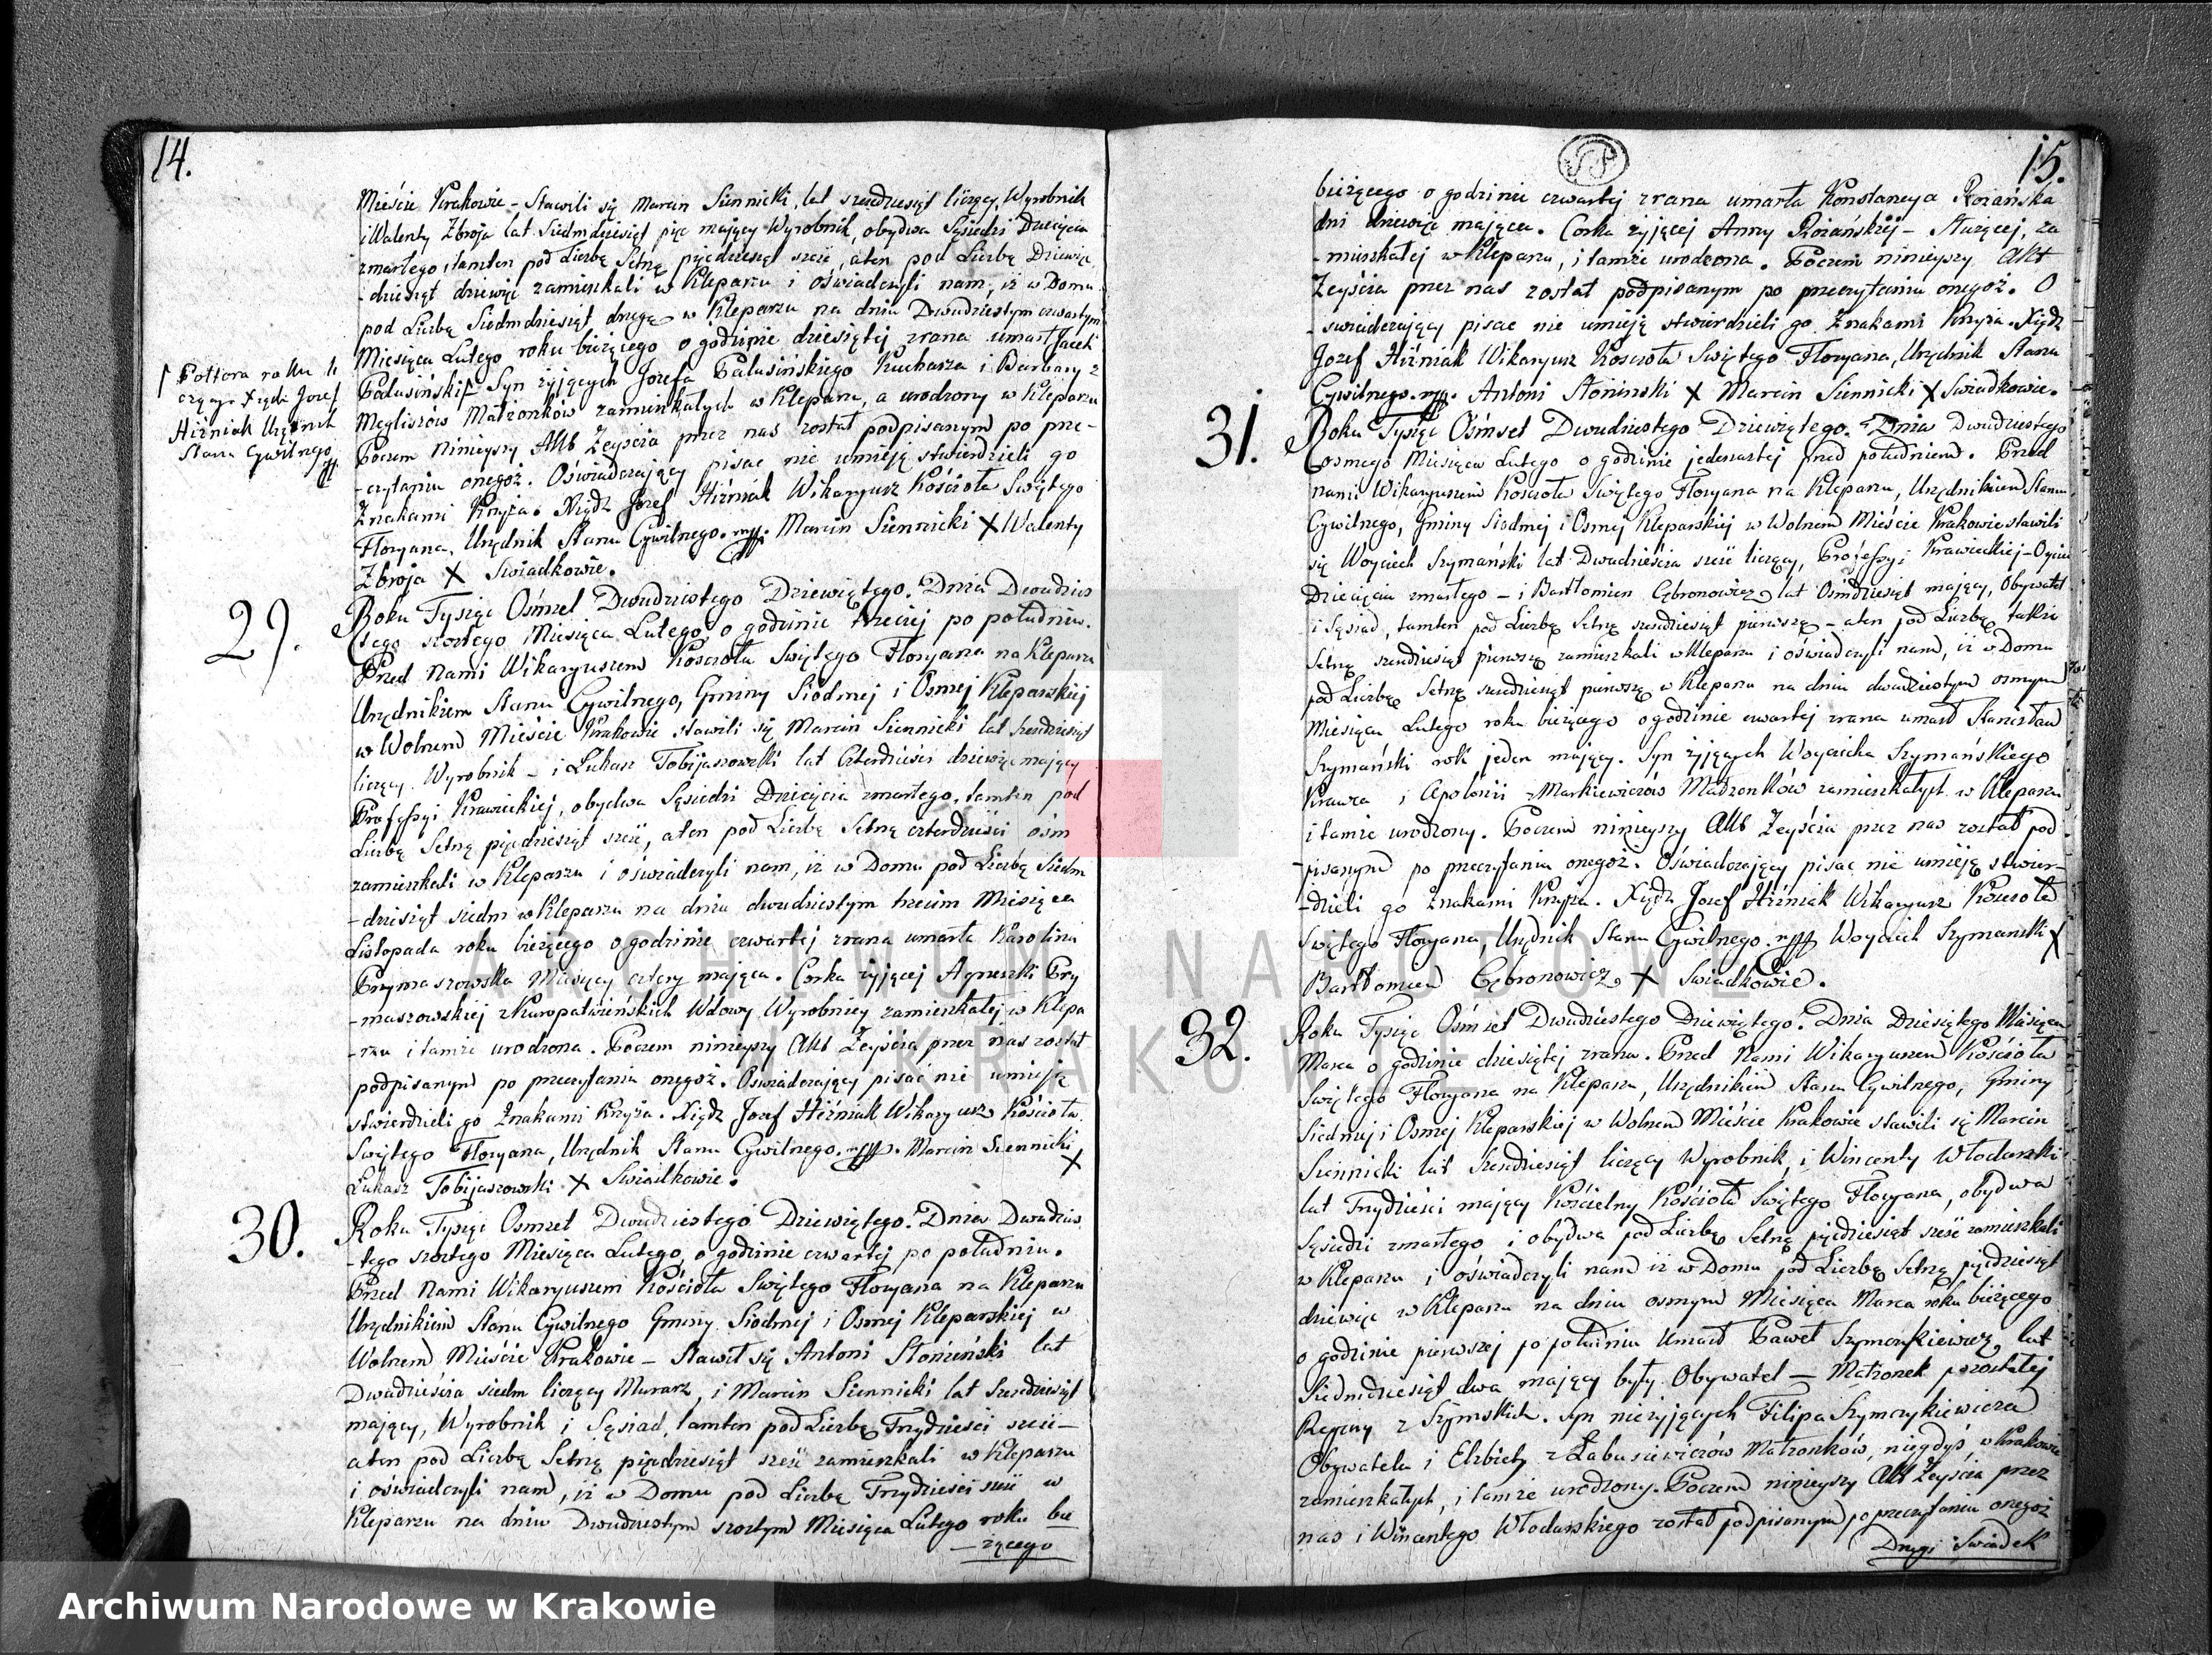 Skan z jednostki: Księga Aktów Zeyścia Parafii Sgo Floryana na Rok 1829